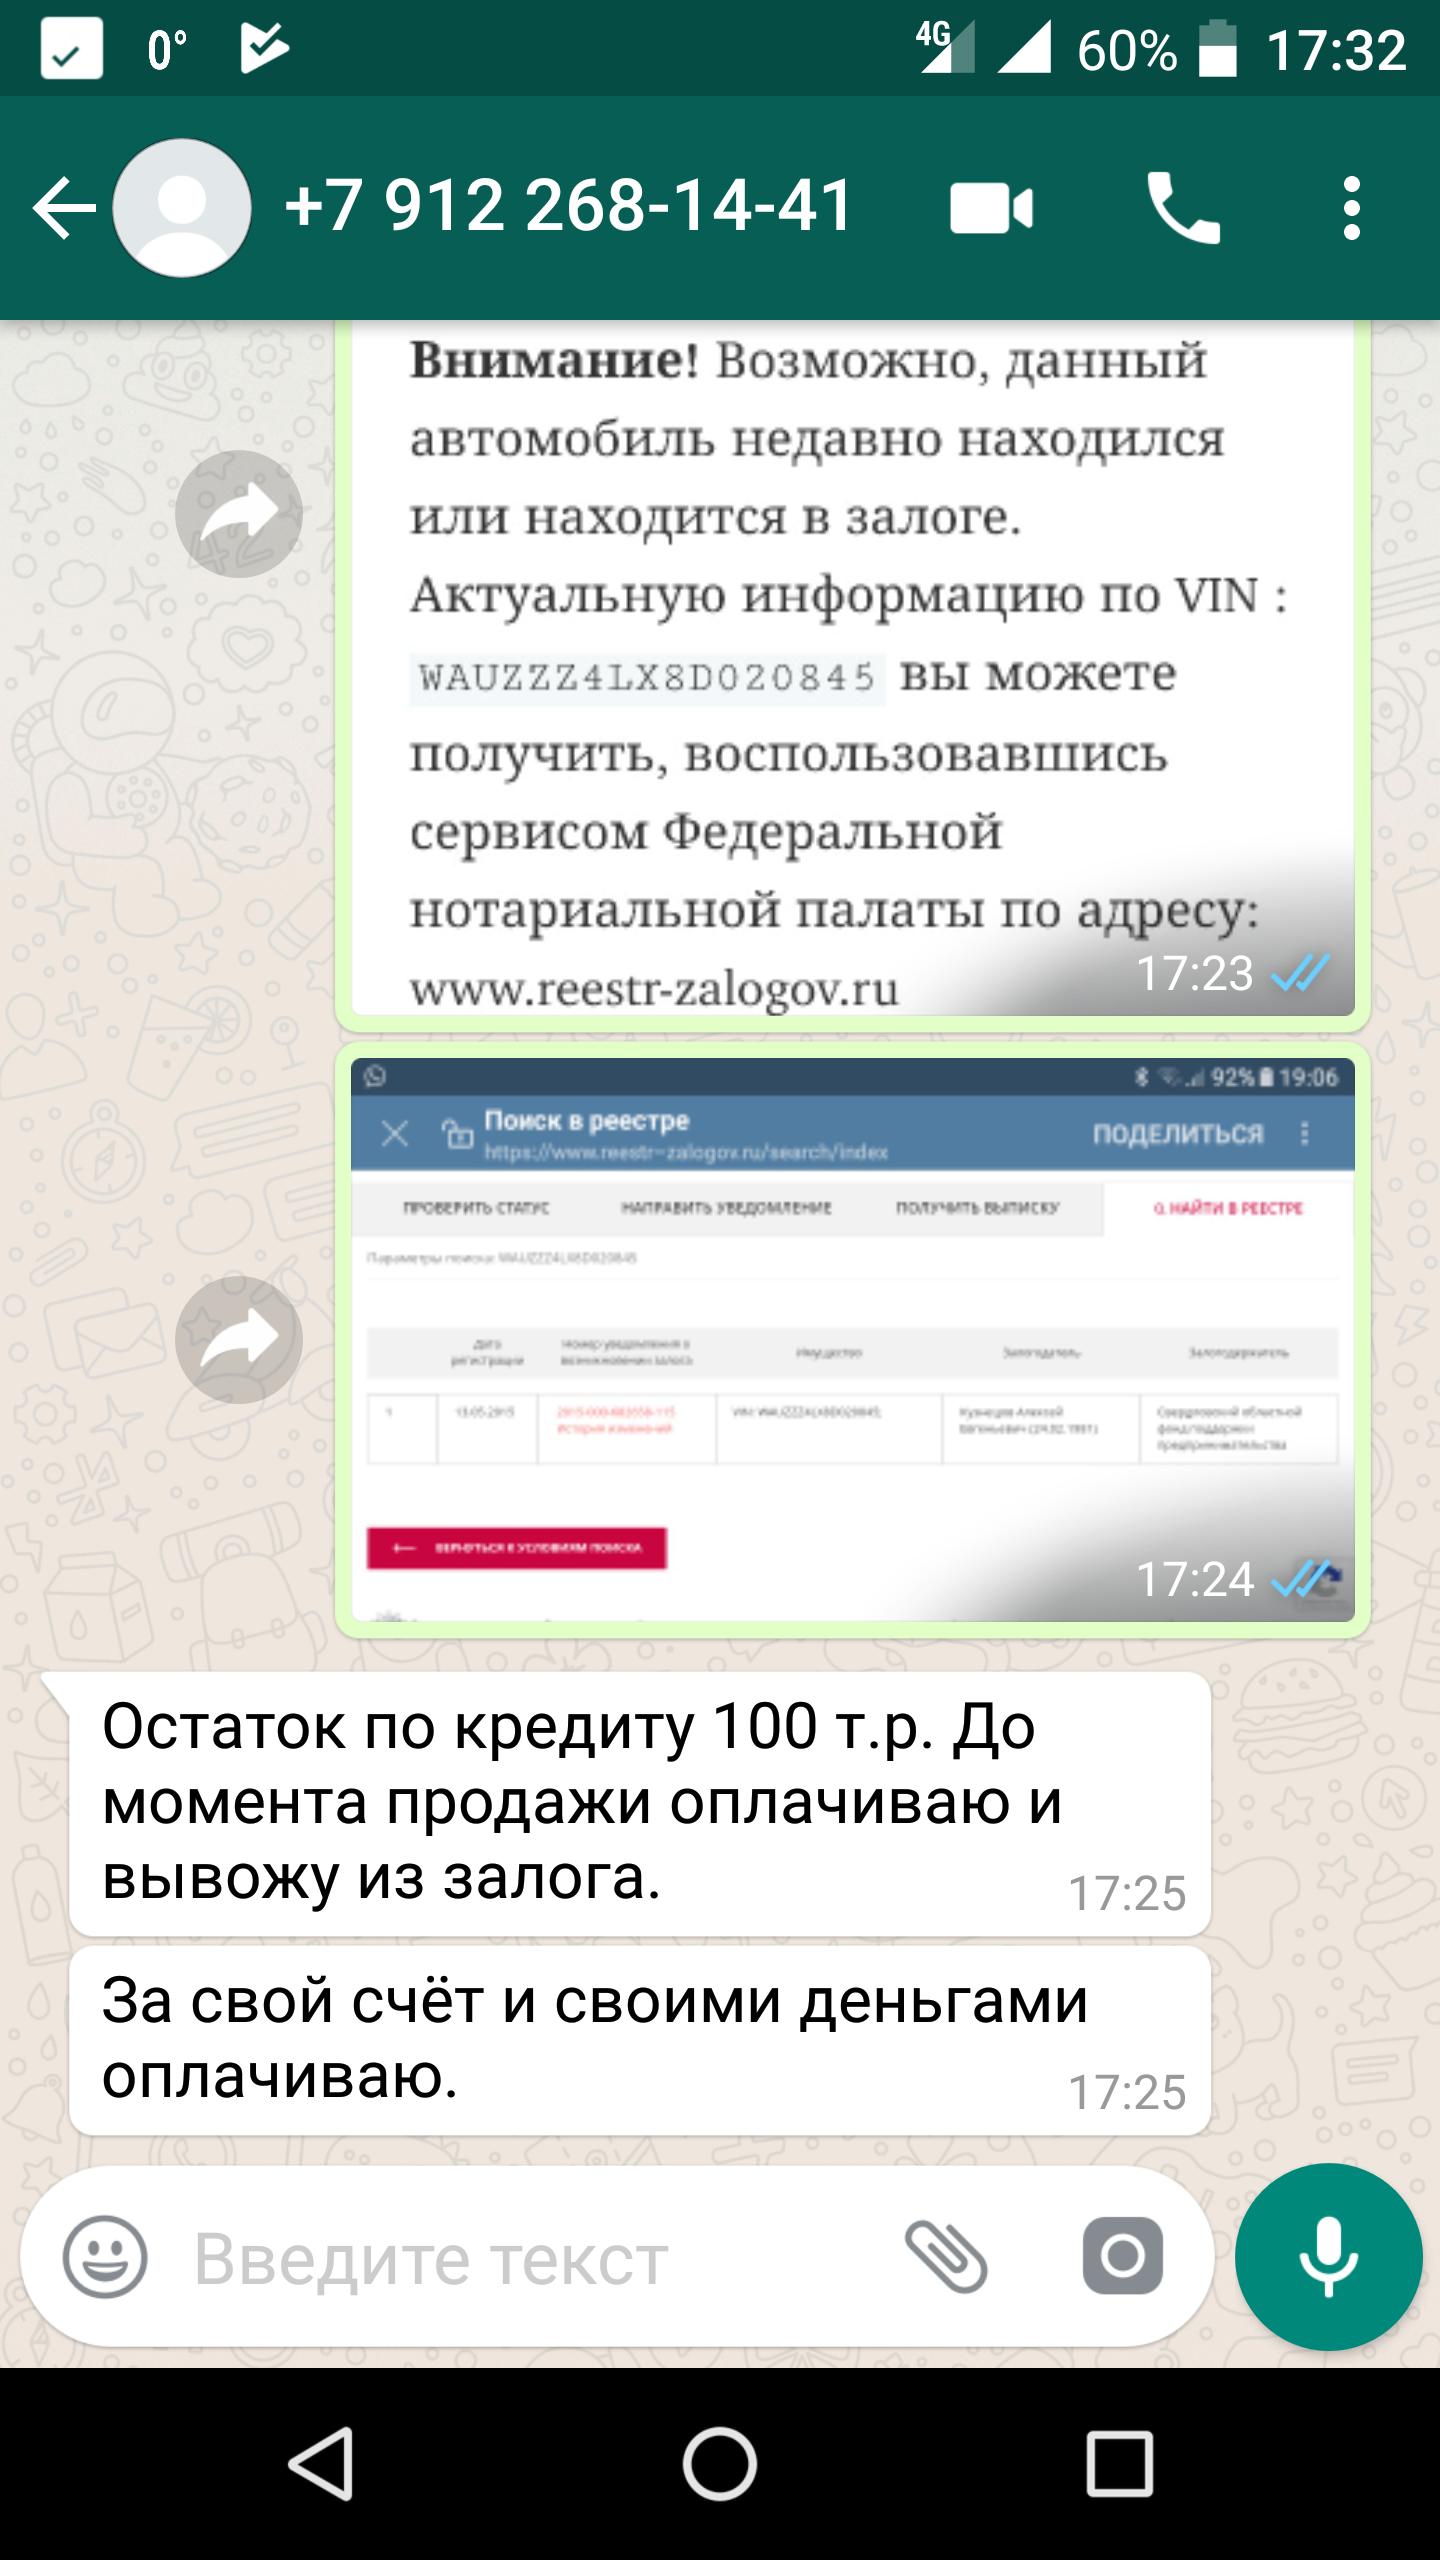 Screenshot_20171116-173214.png